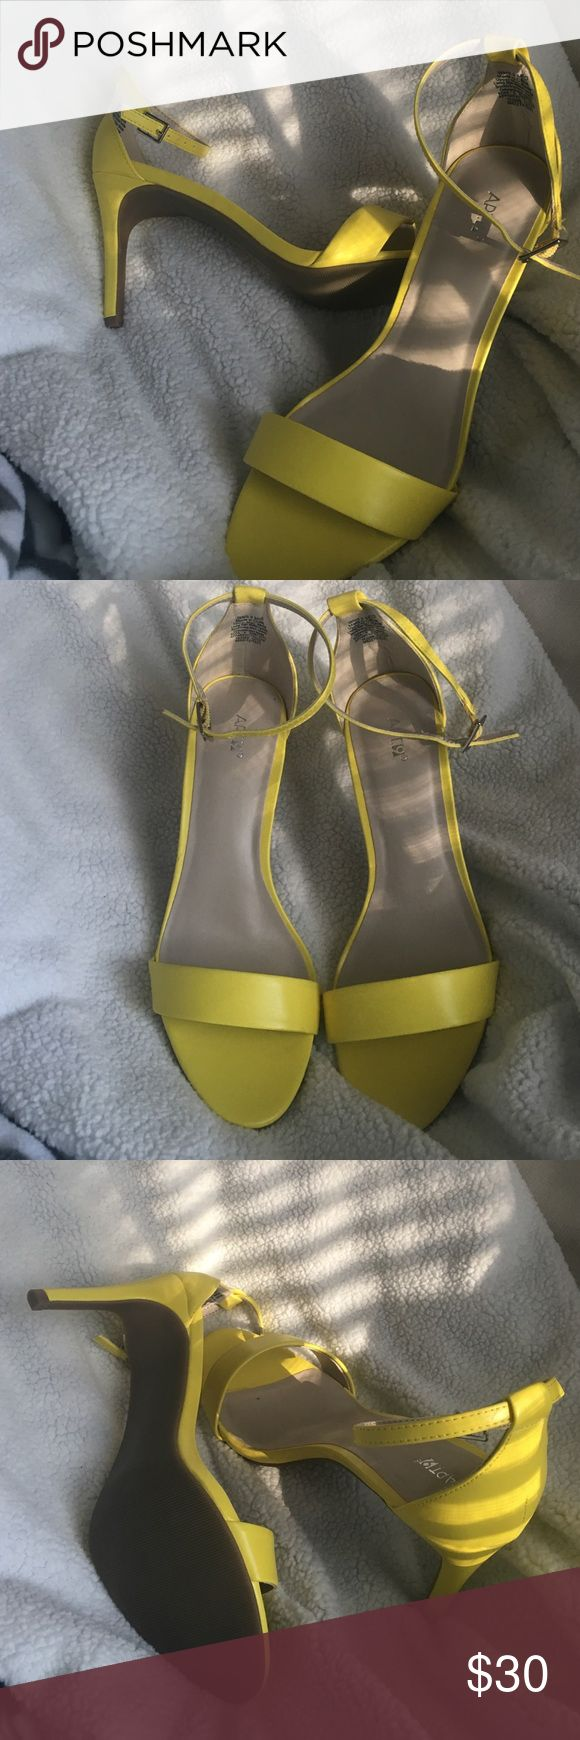 Apt 9 Lemon Yellow High Heels Brand new high heels size 9. Perfect condition!! Make an offer! :-) Apt. 9 Shoes Heels